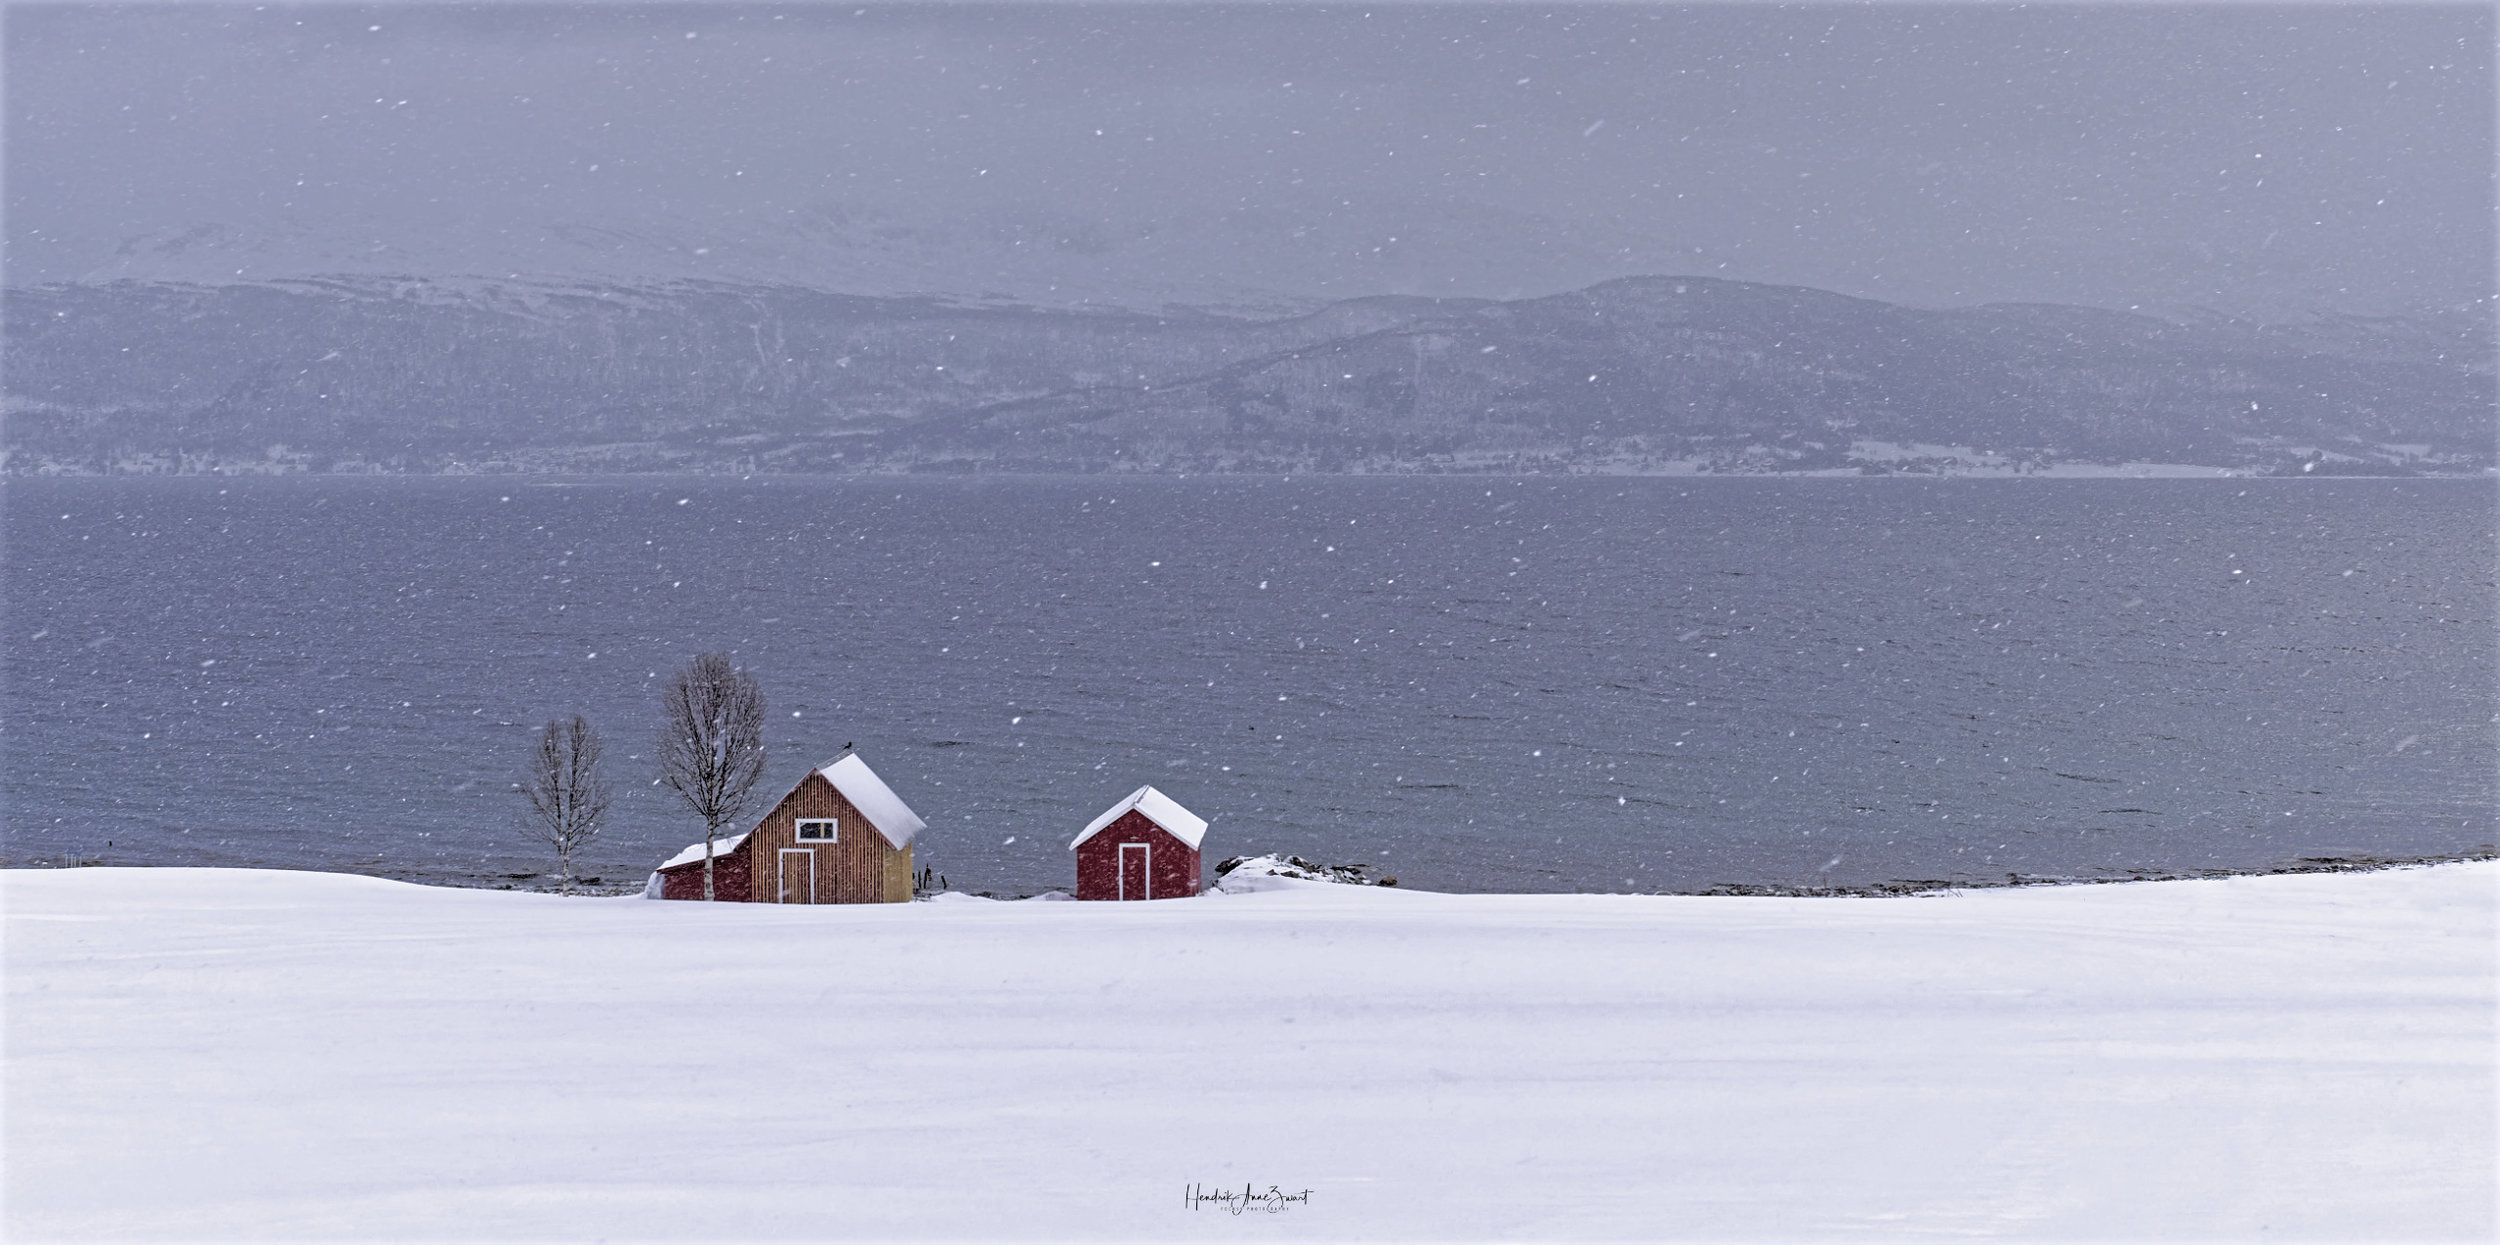 Gibo_Two_Housee_Norway_1.jpg